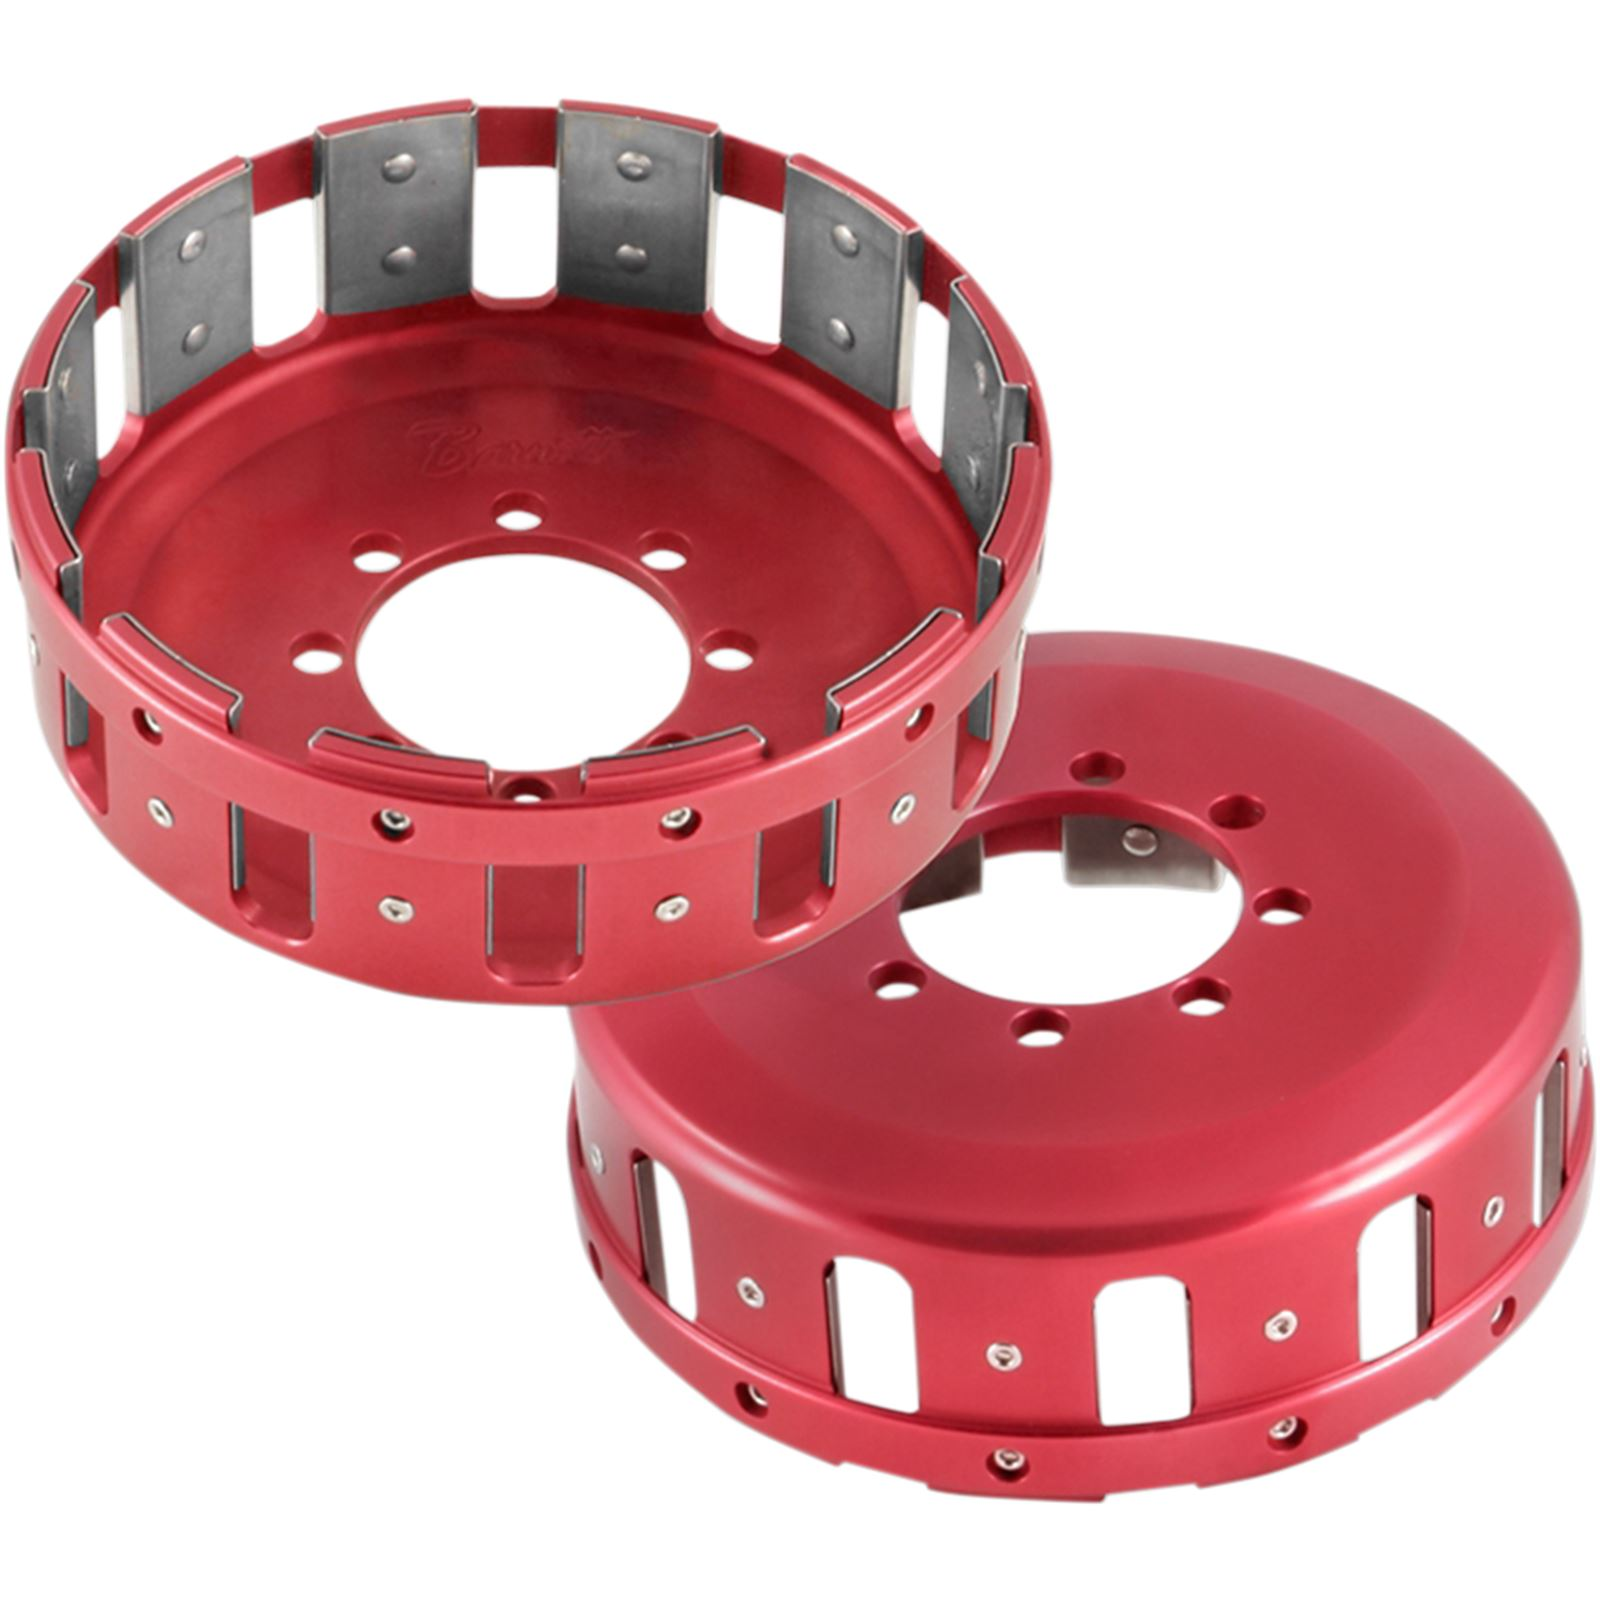 Barnett Performance Ducati Clutch Basket - Red